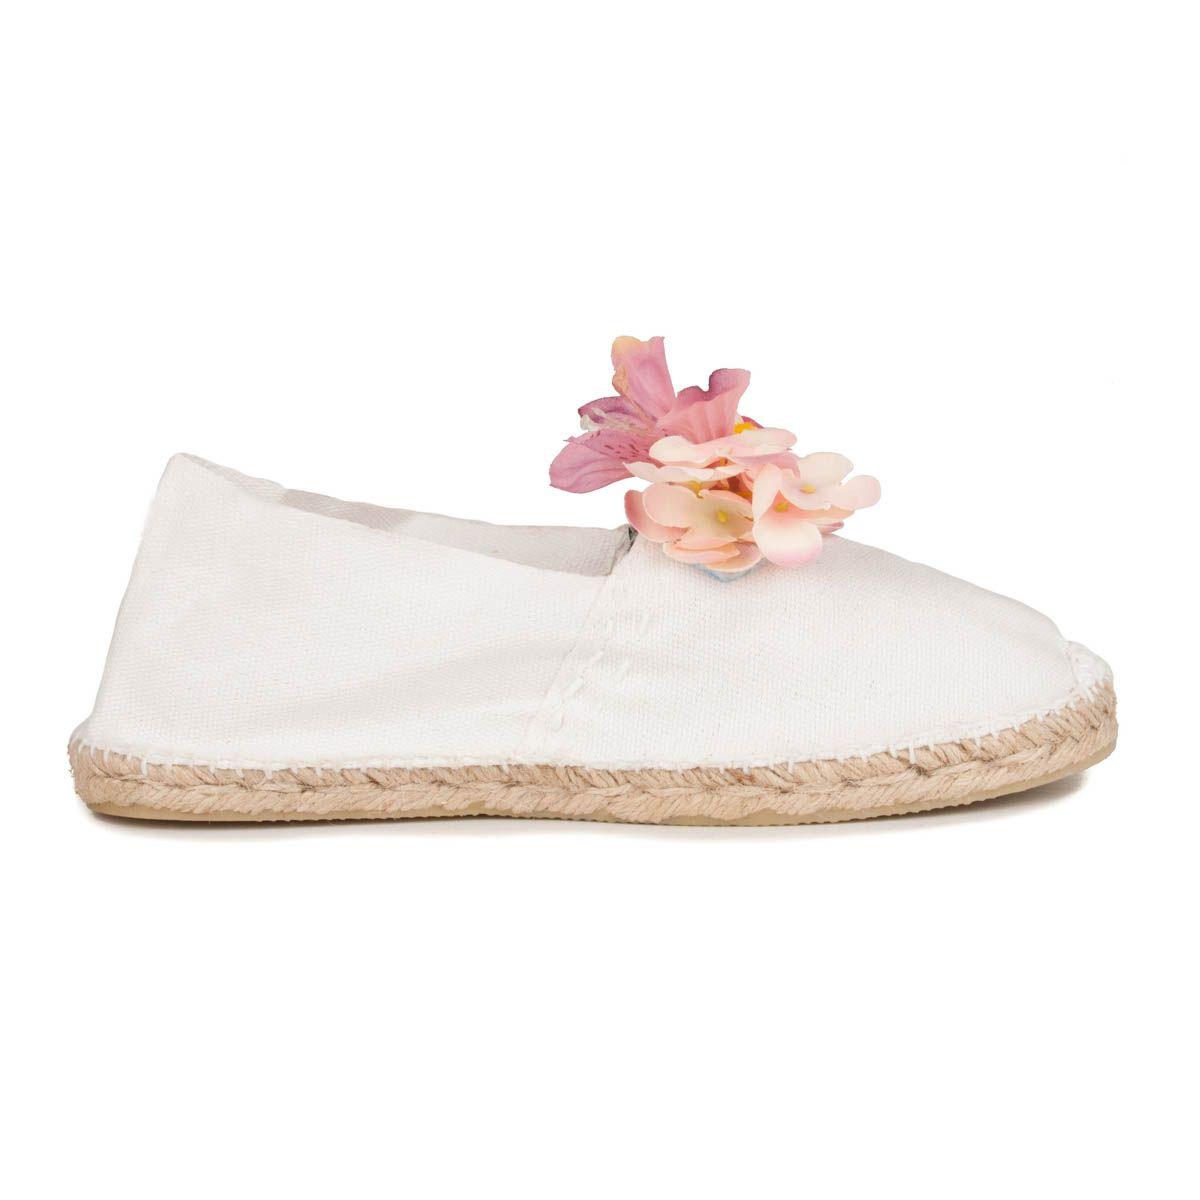 Maria Graor Floral Espadrille in White